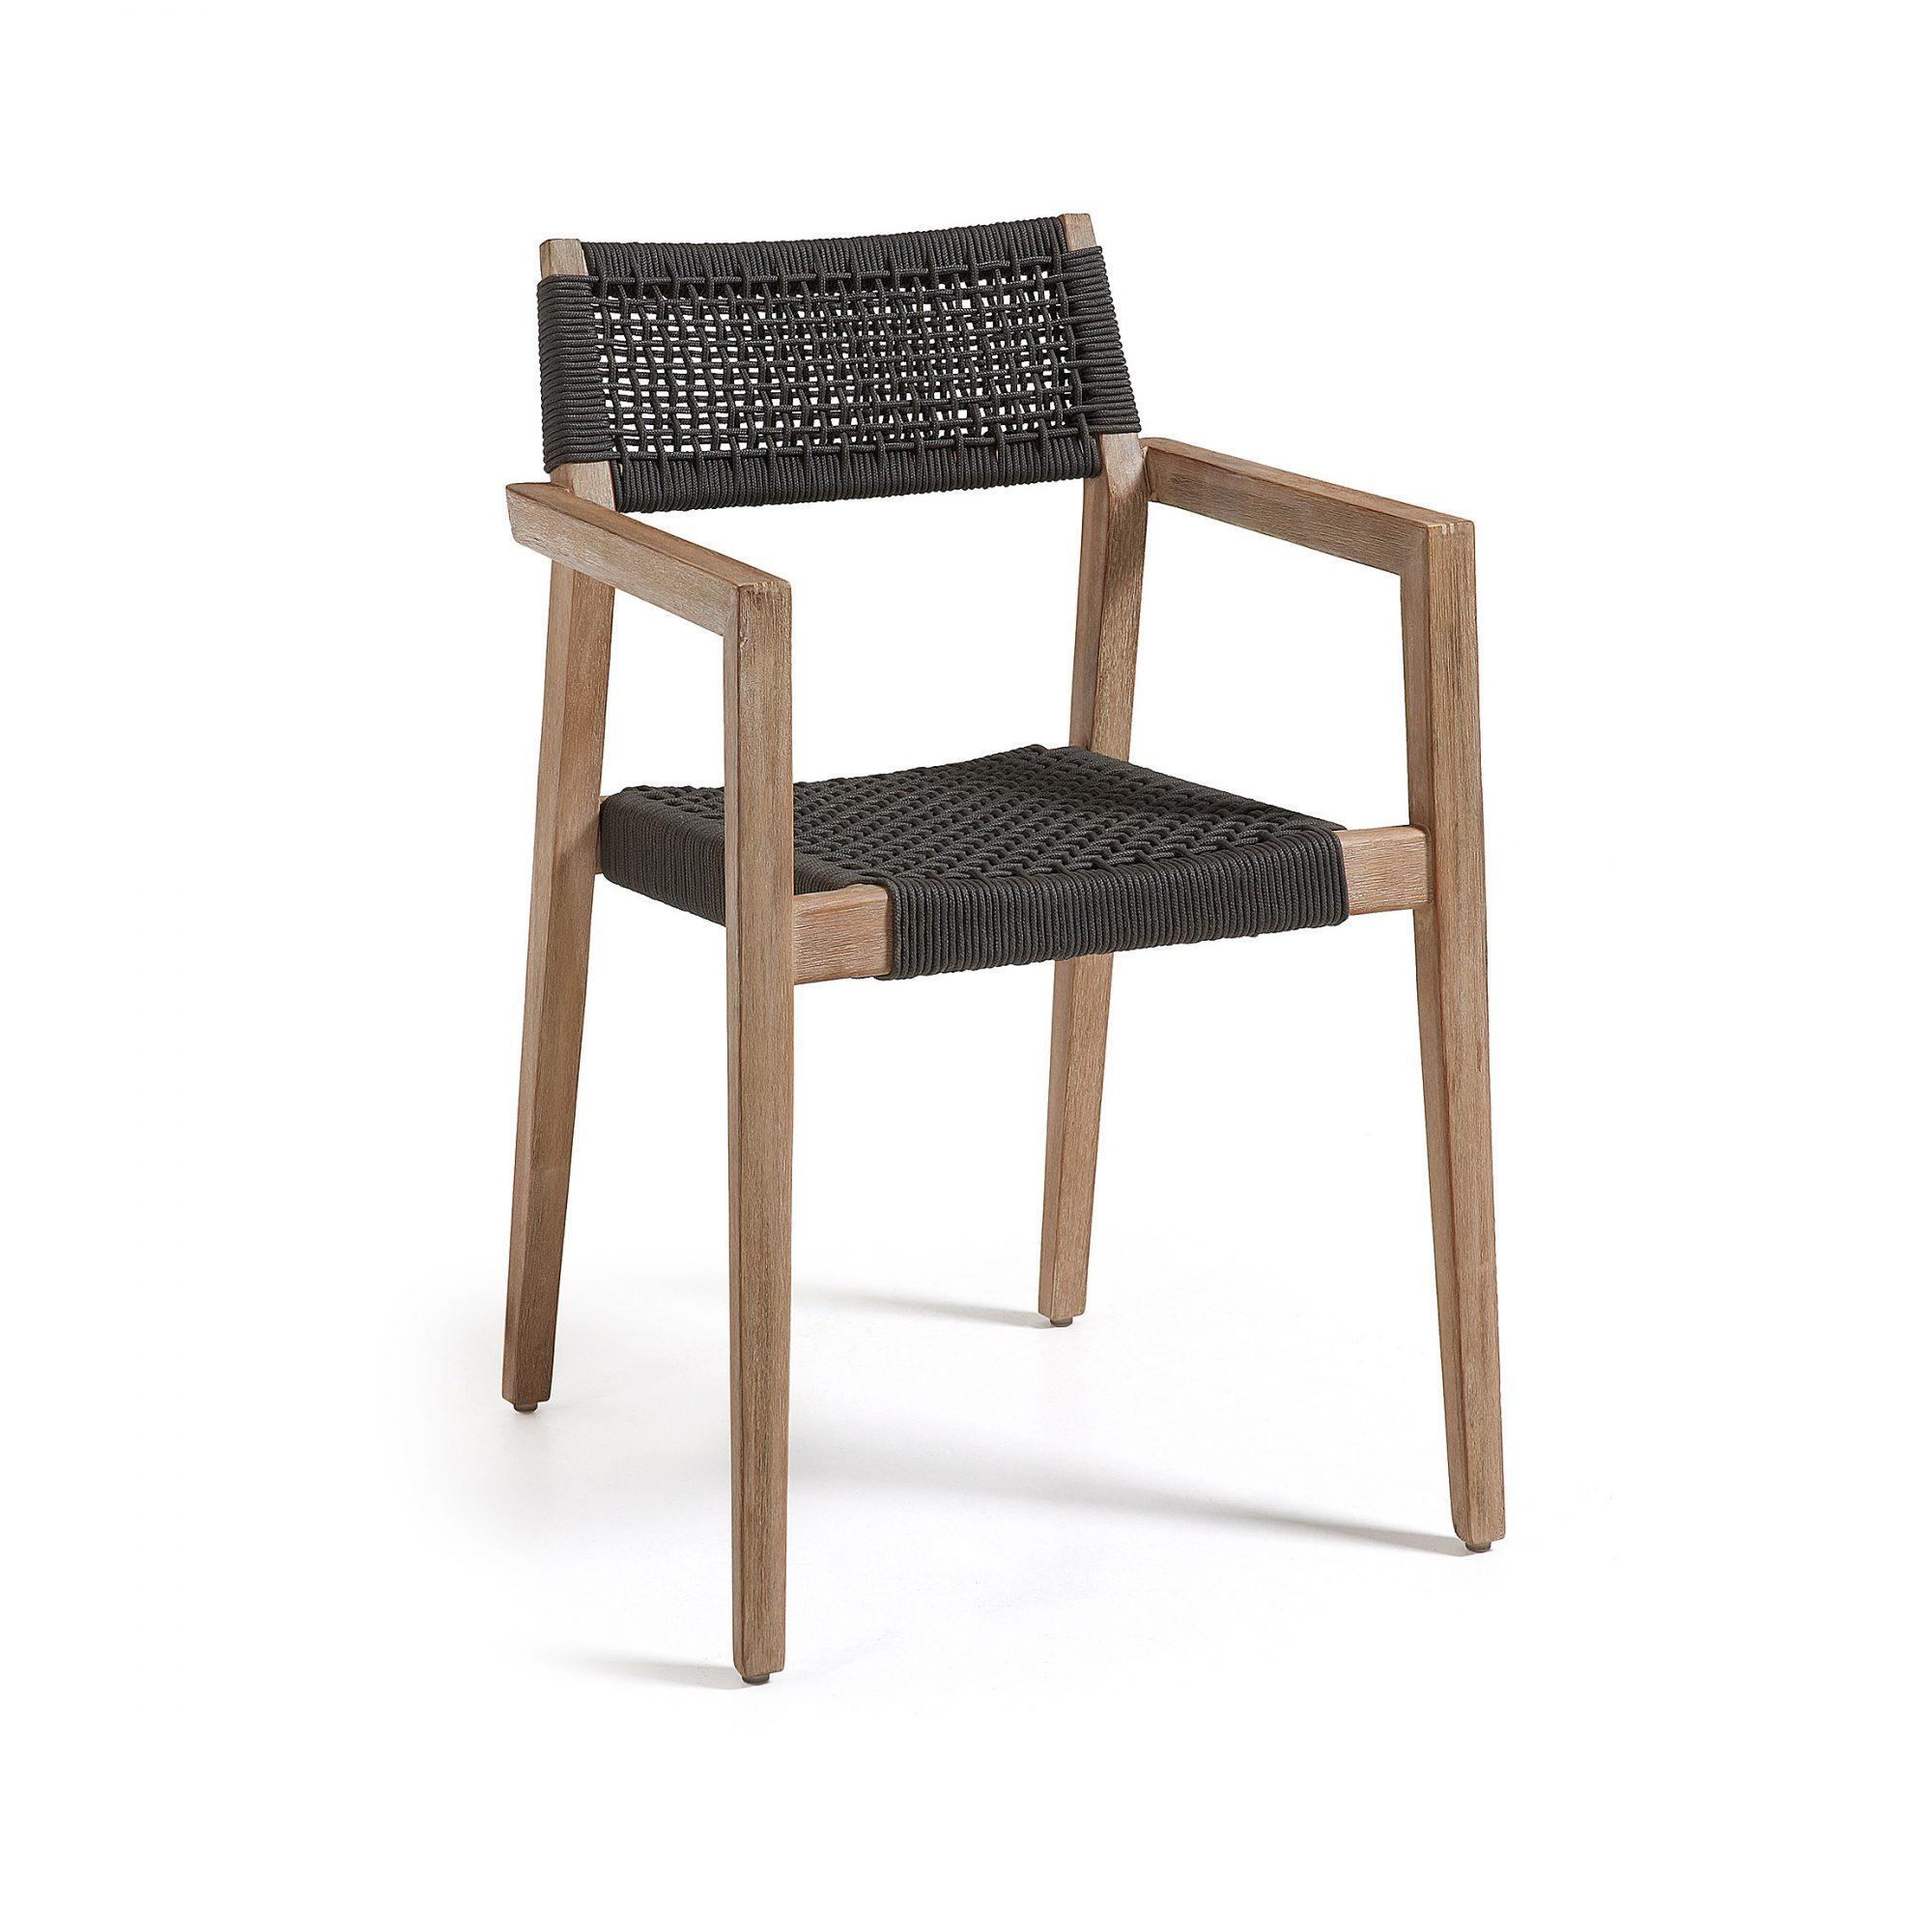 Marvelous Corvette Chair Ibusinesslaw Wood Chair Design Ideas Ibusinesslaworg